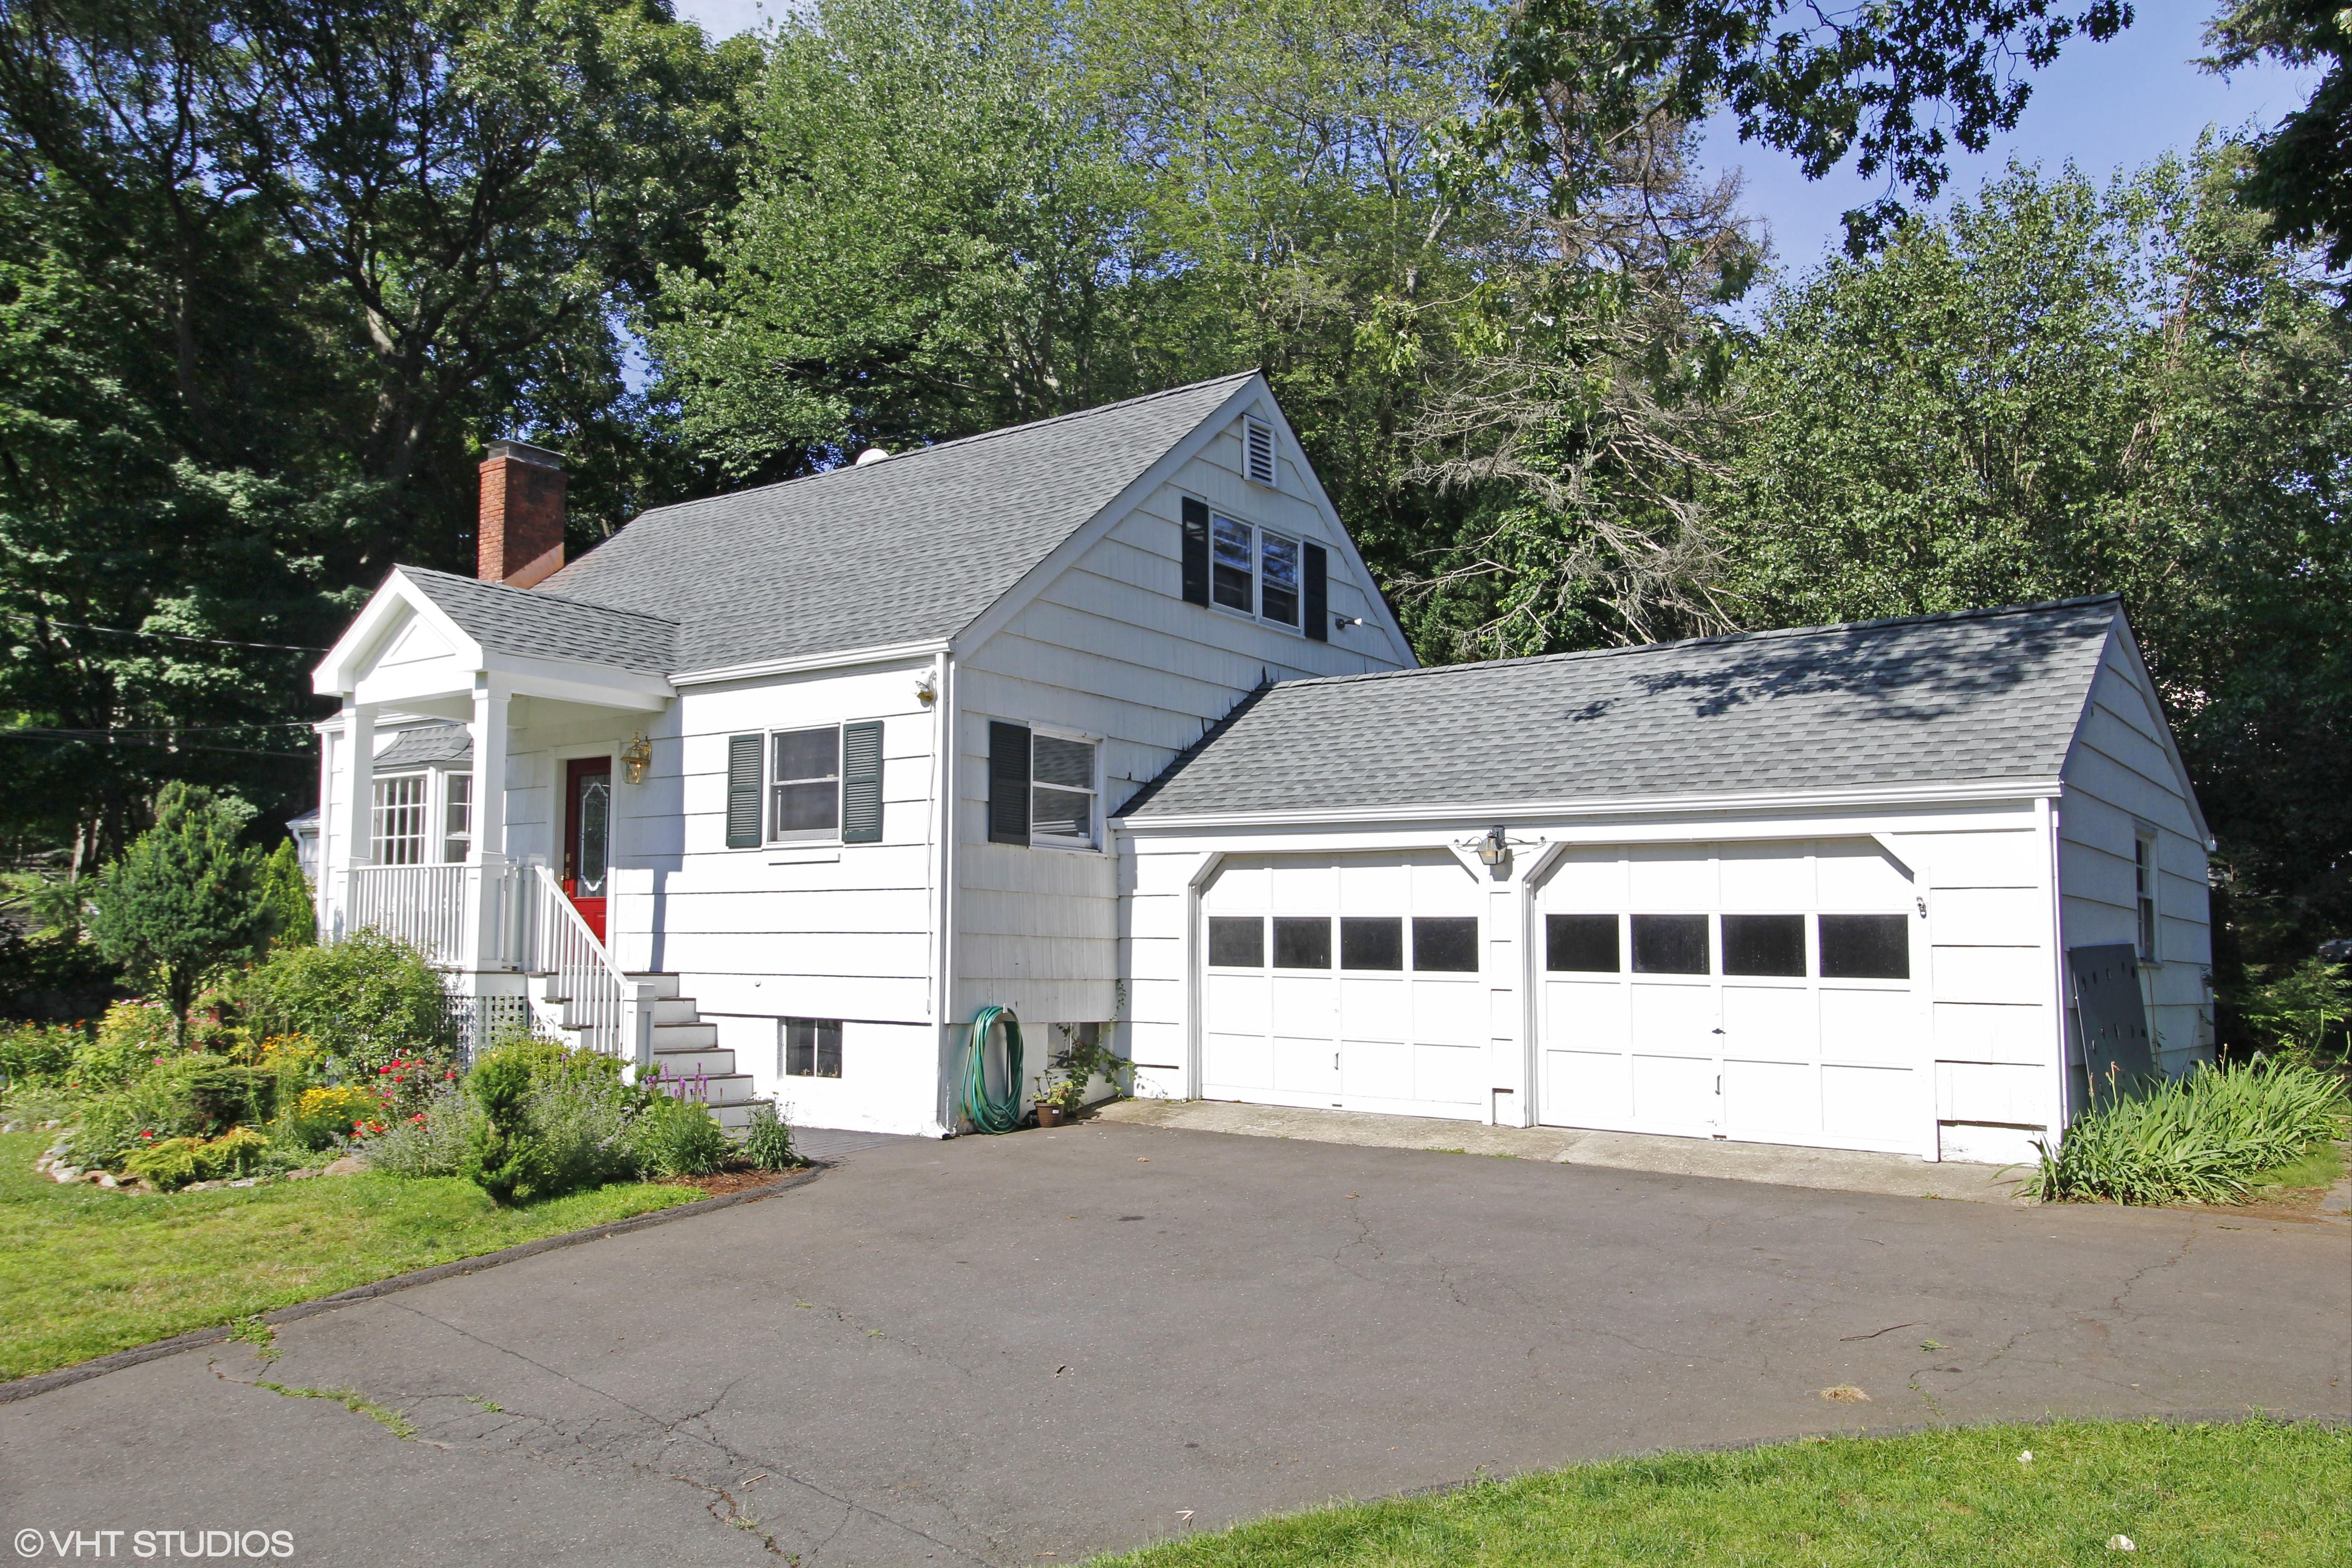 Villa per Vendita alle ore Sunny, Bright, Happy Classic Expanded Cape 326 Rowayton Avenue Rowayton, Norwalk, Connecticut 06853 Stati Uniti